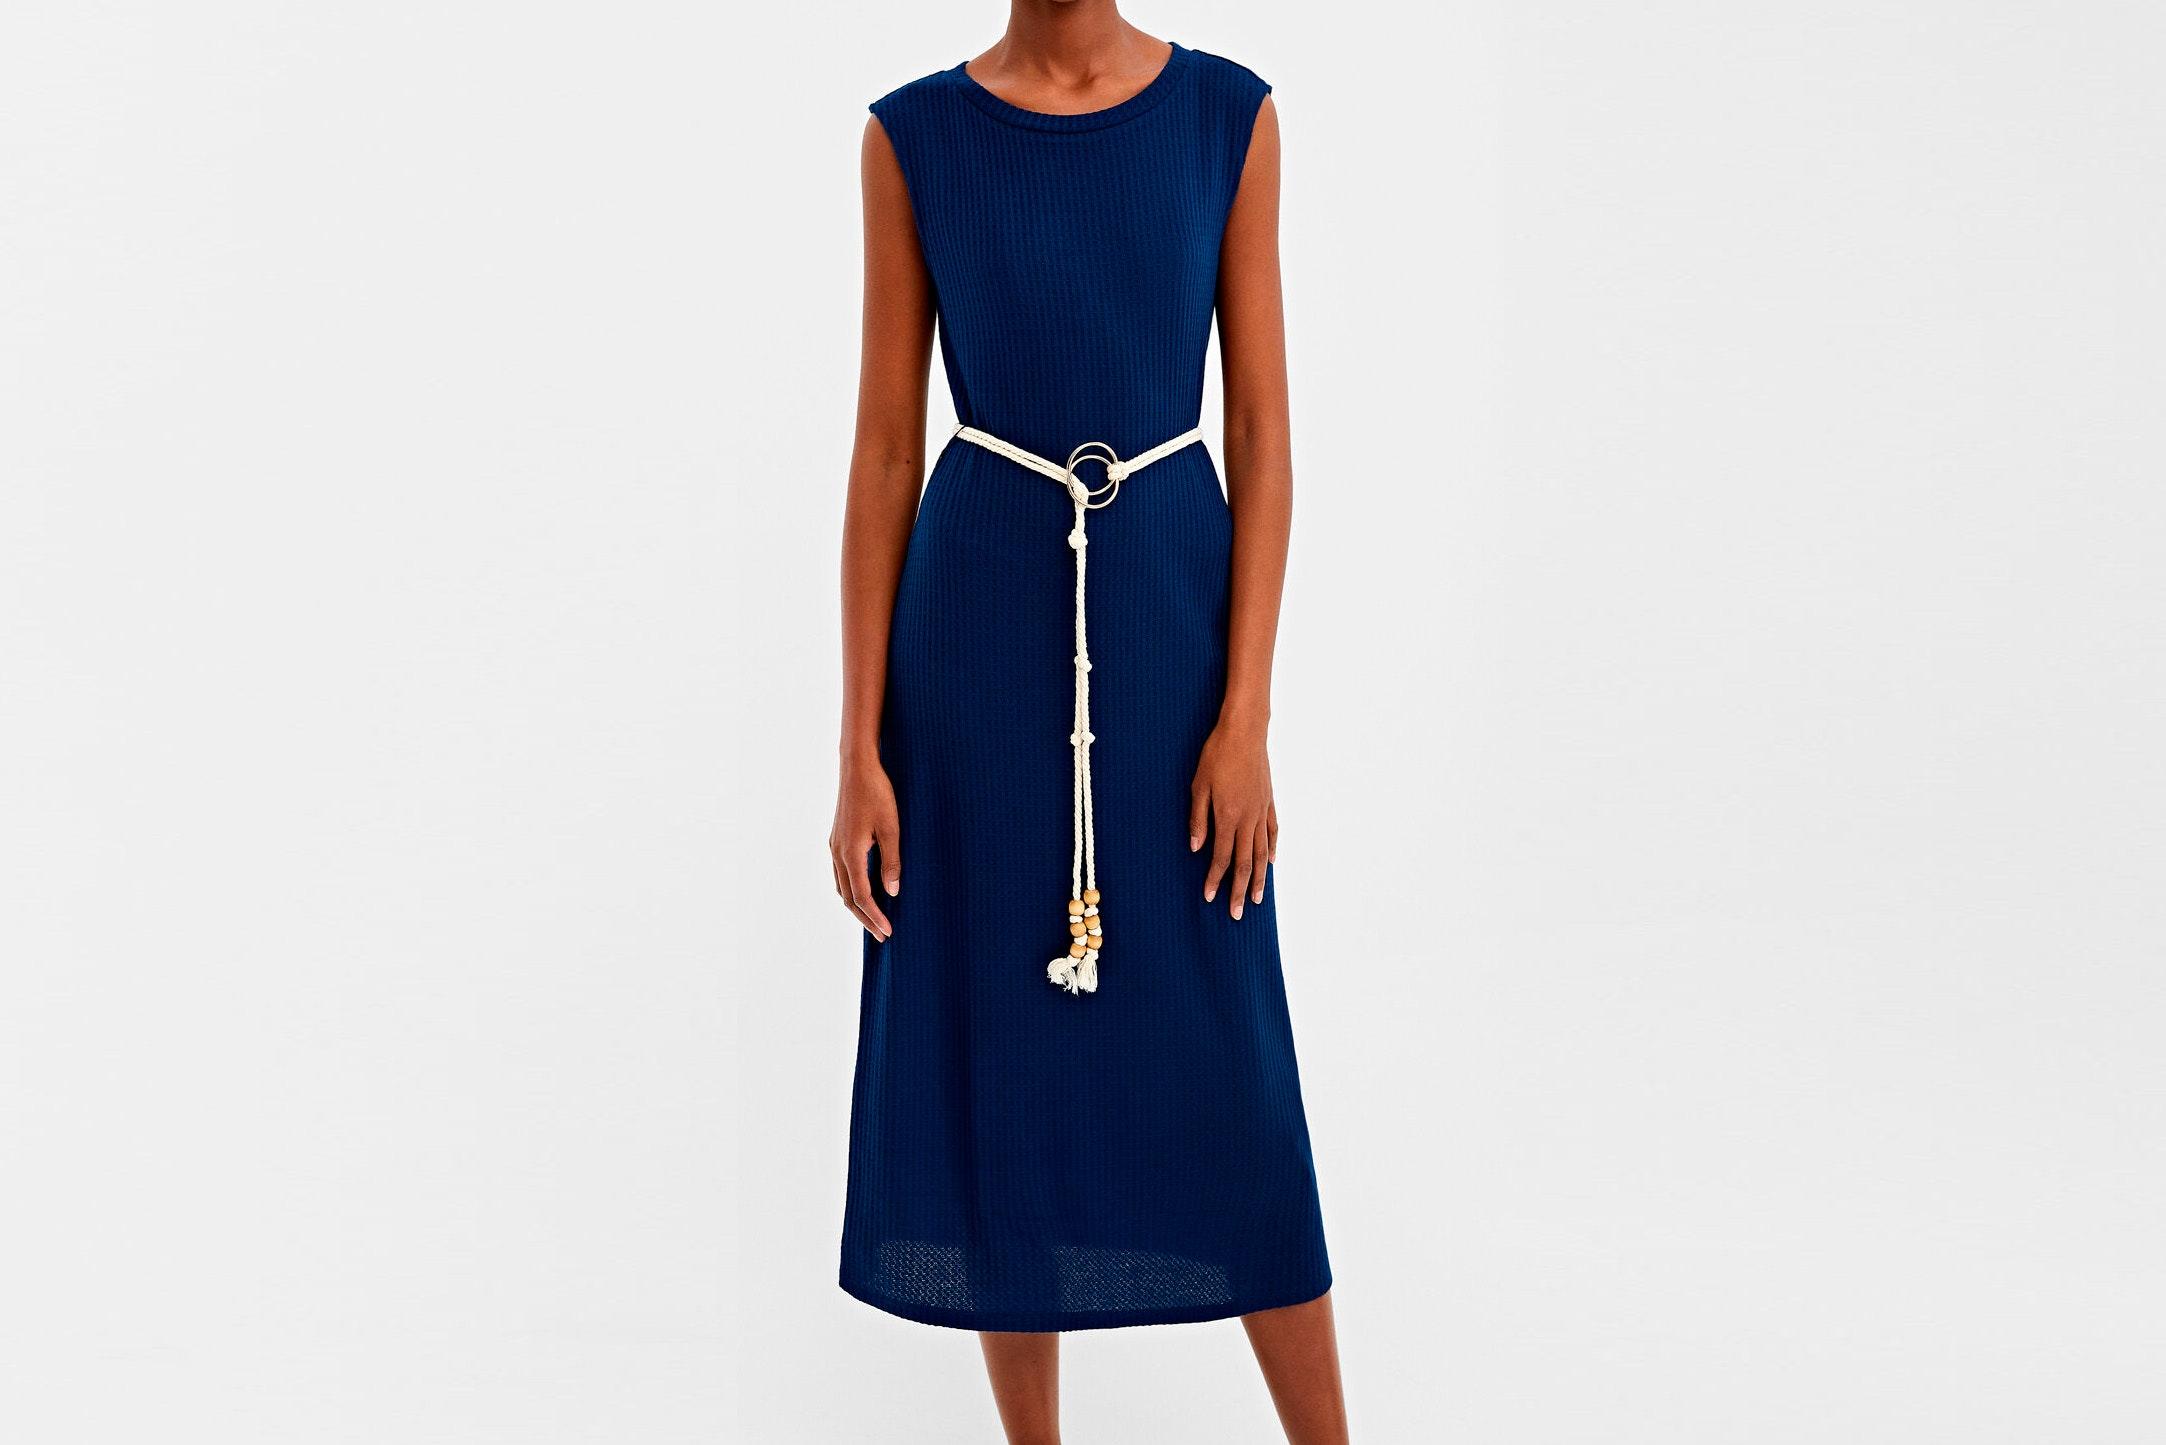 Vestido azul springfield